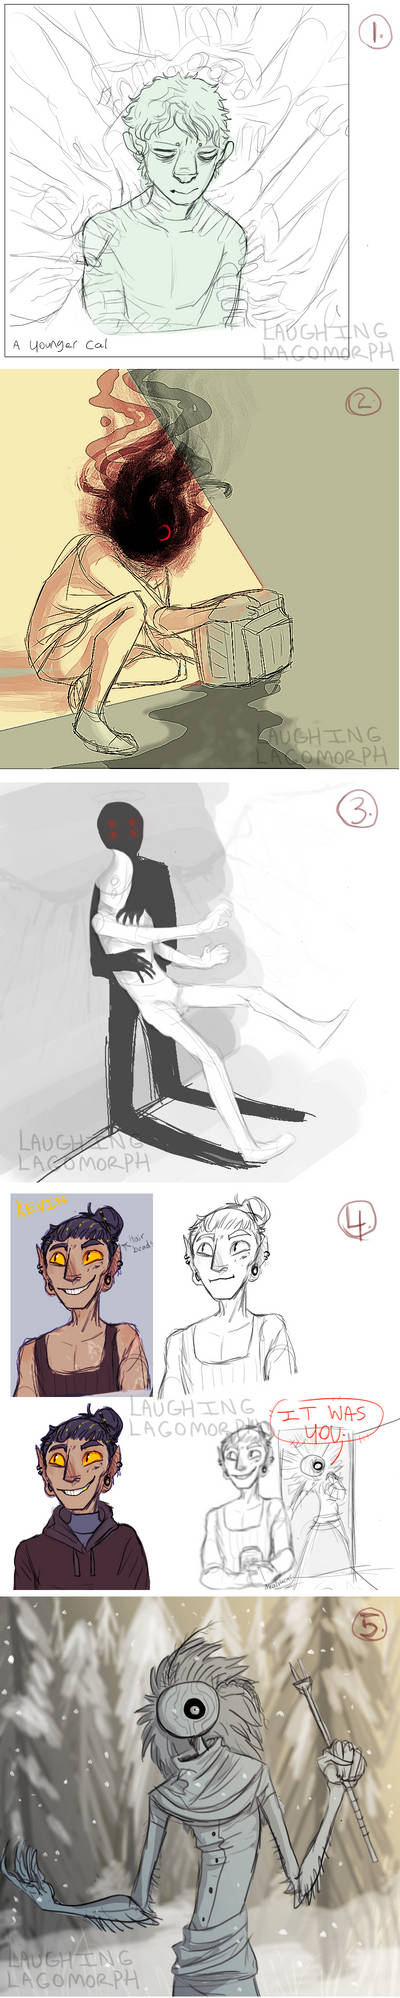 SD 23 by Laughing-Lagomorph